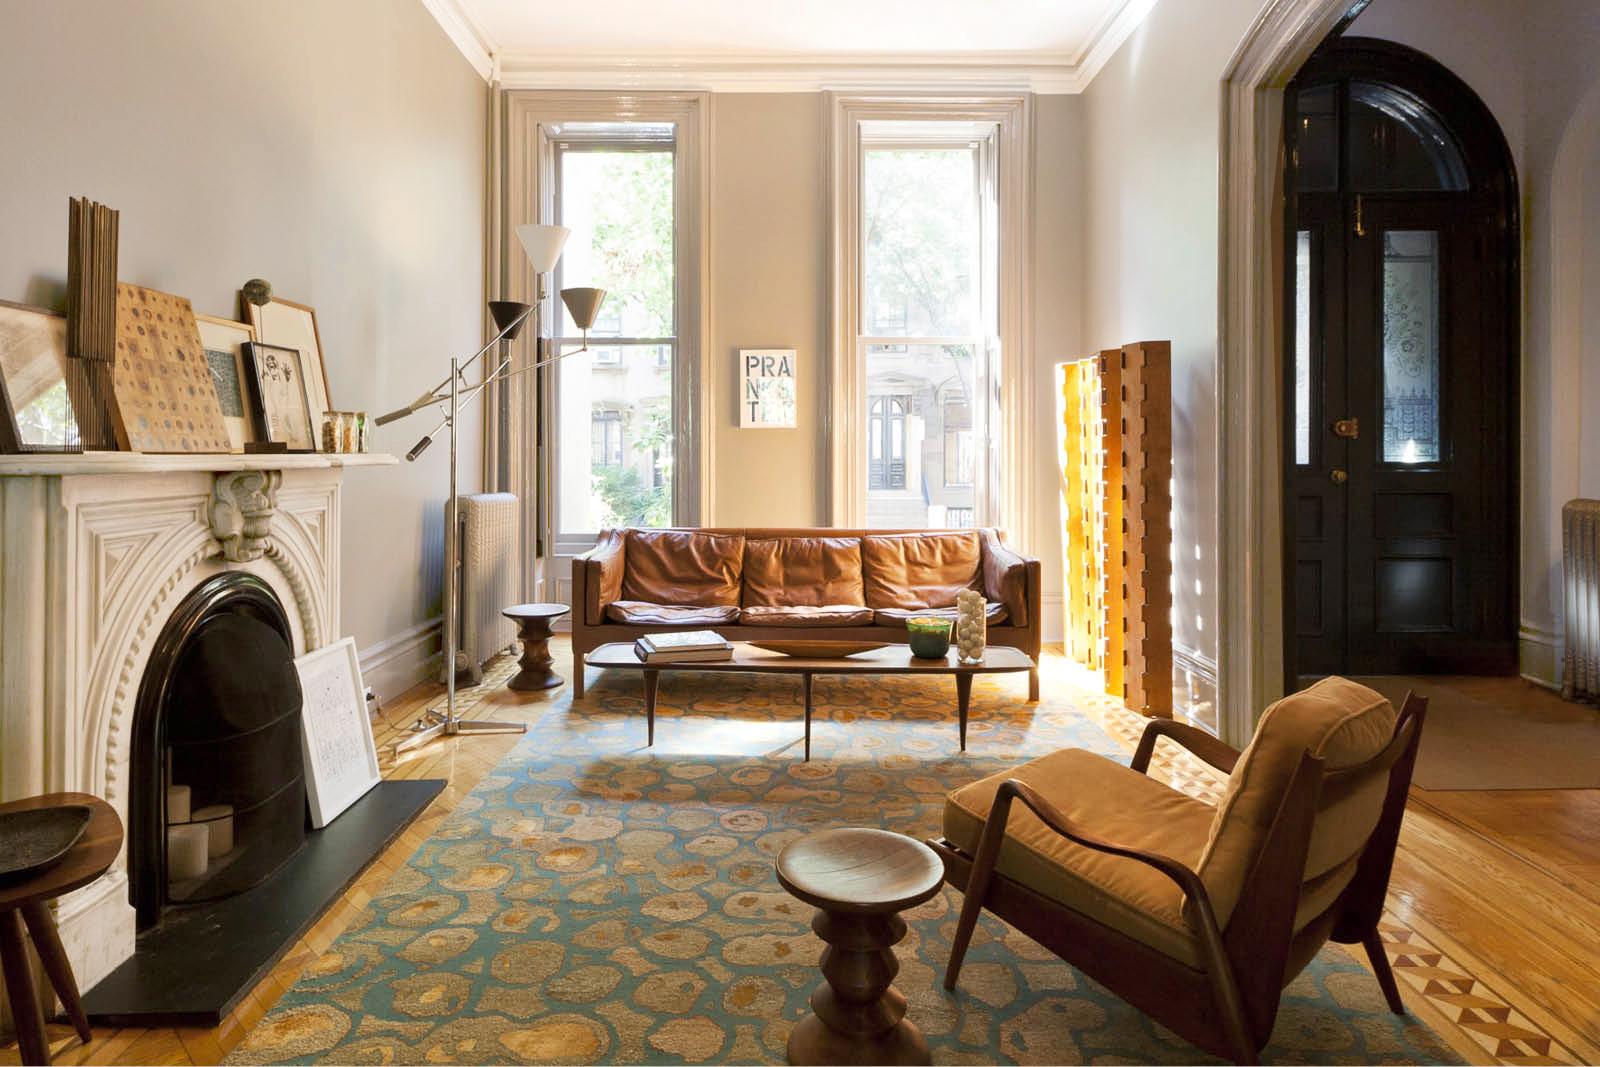 03-res4-resolution-4-architecture-modern-residential-warren-street-townhouse-interior-living-room-01.jpg